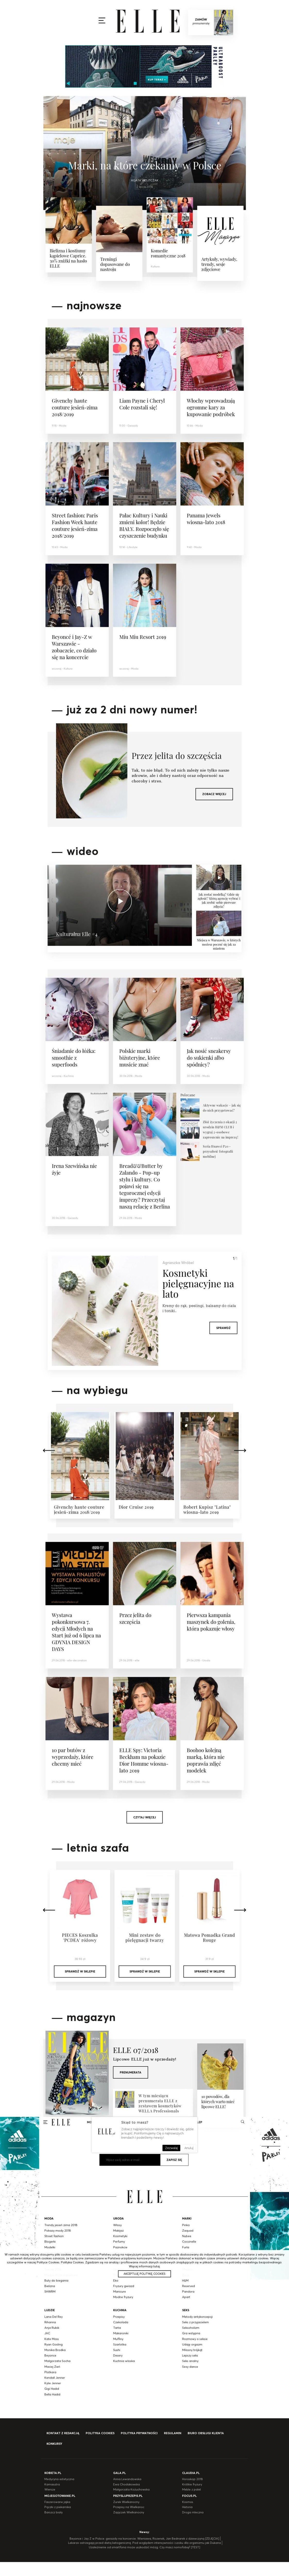 Moda Uroda Trendy Z Magazynu Elle Trendy Wiosna Lato 2018 Modne Fryzury Buty Manicure Web Design Website Design Web Design Inspiration